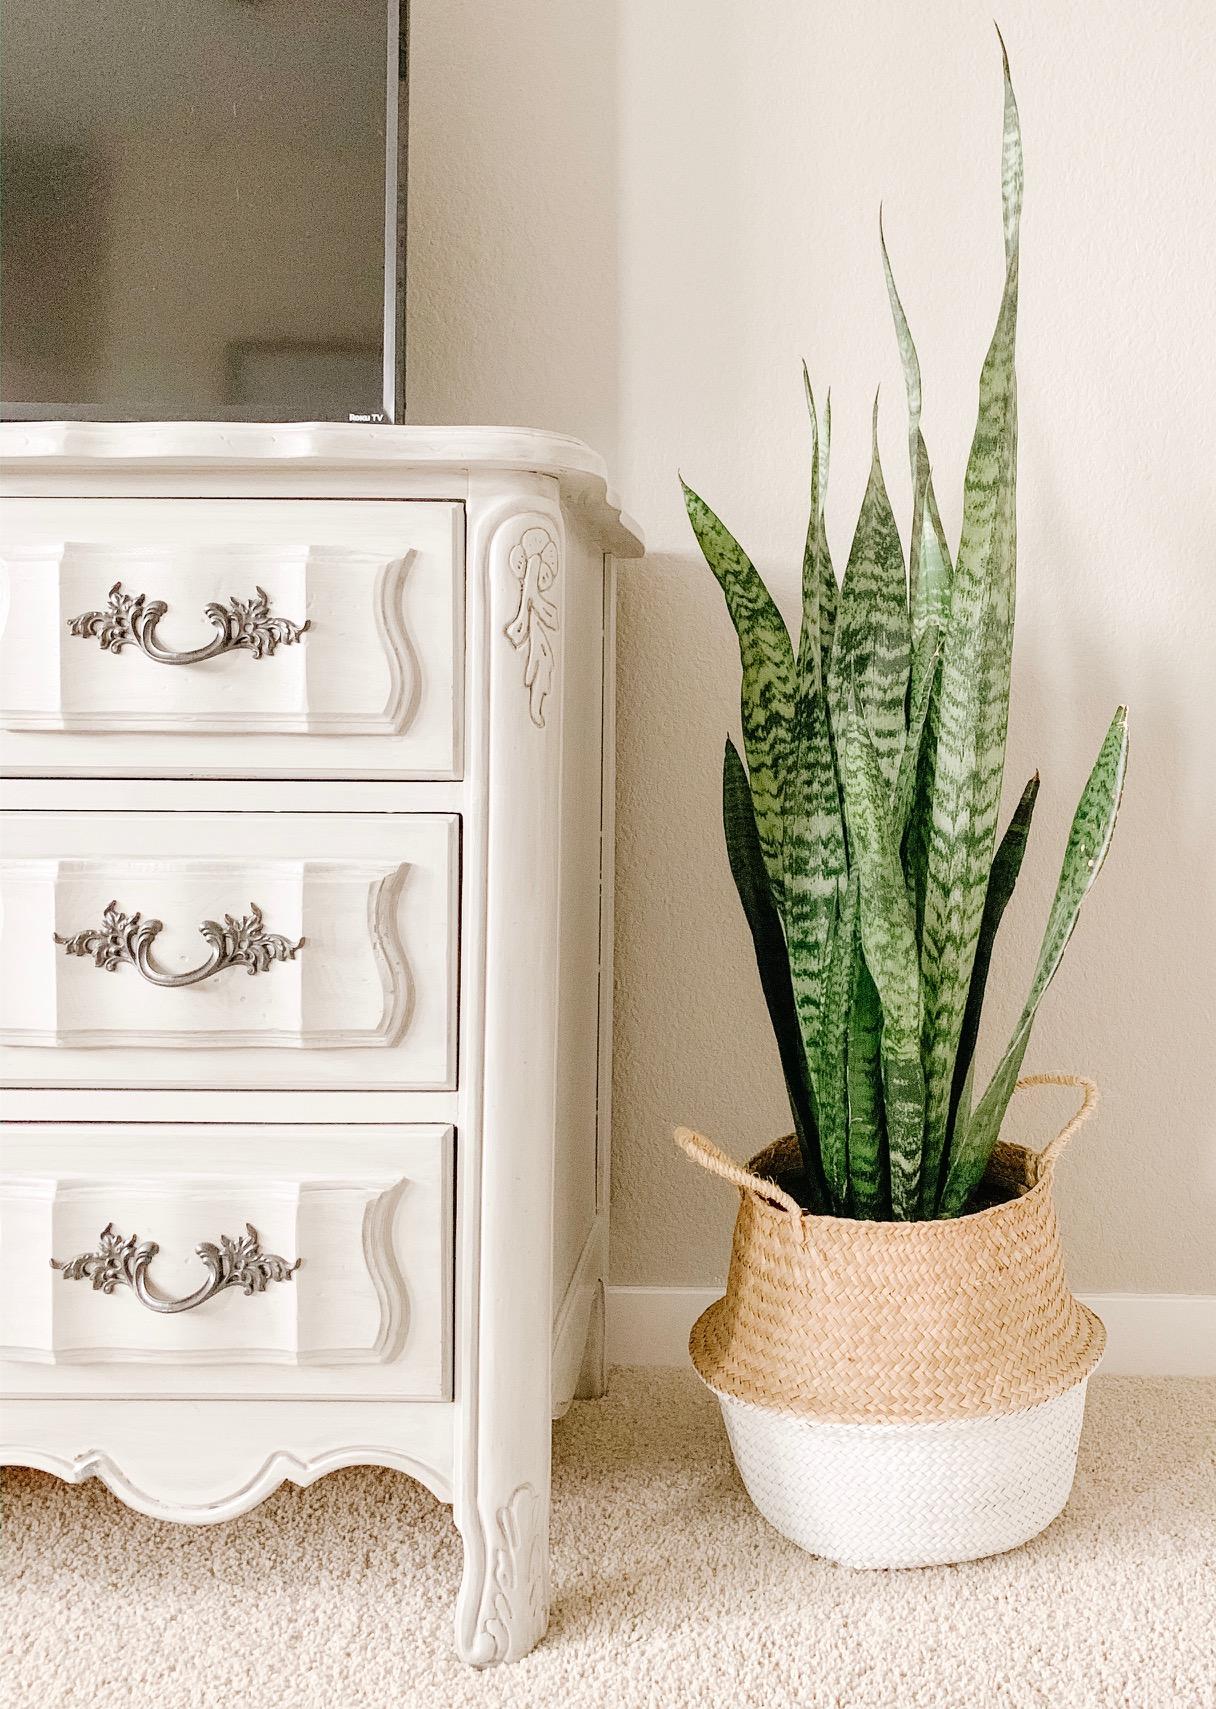 snake plant in a basket